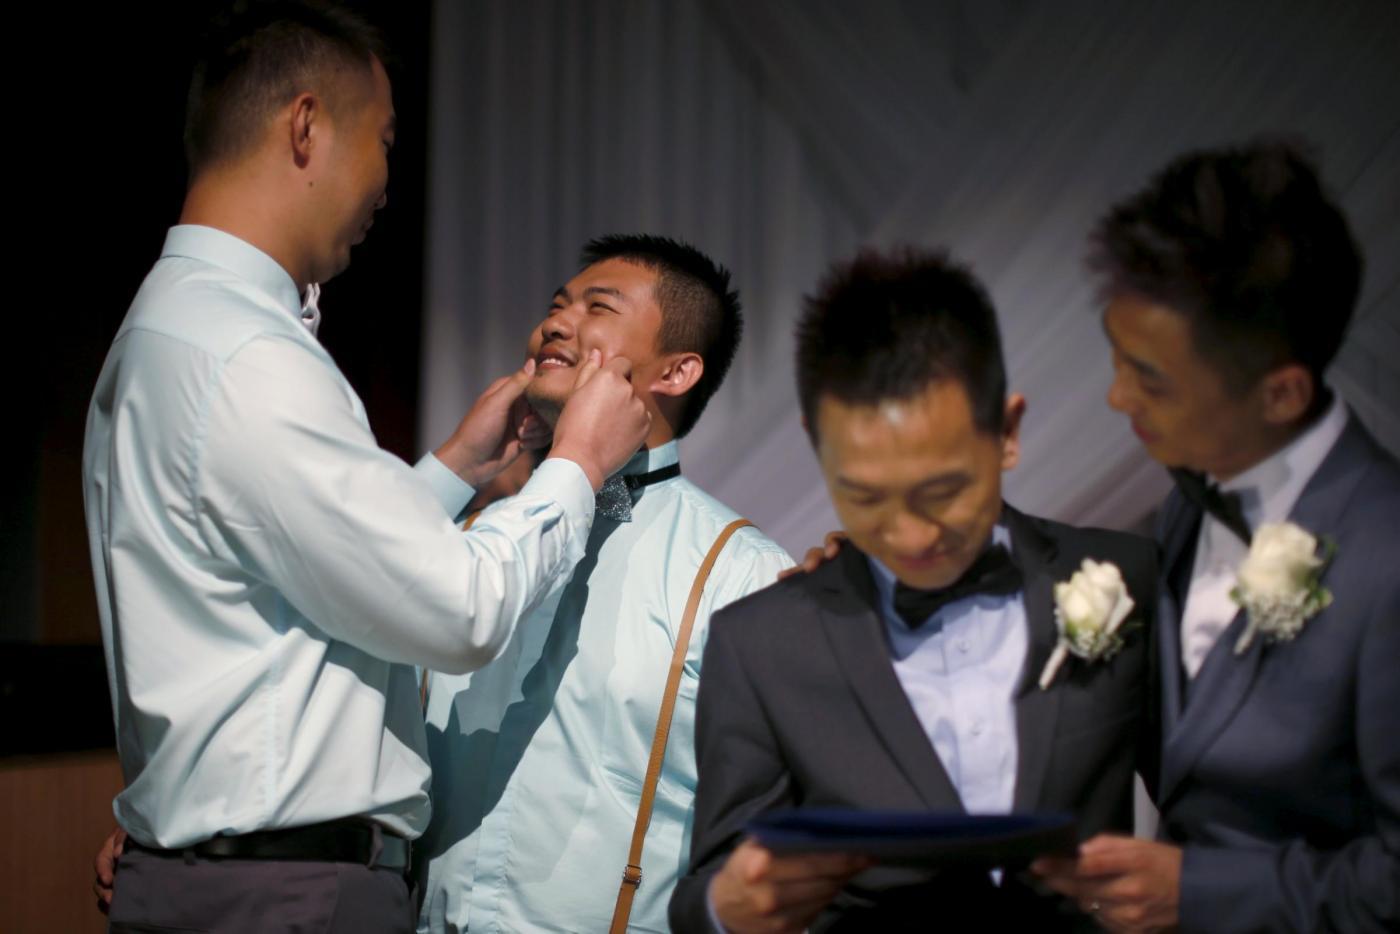 Sette coppie omosessuali cinesi si sposano a Los Angeles16